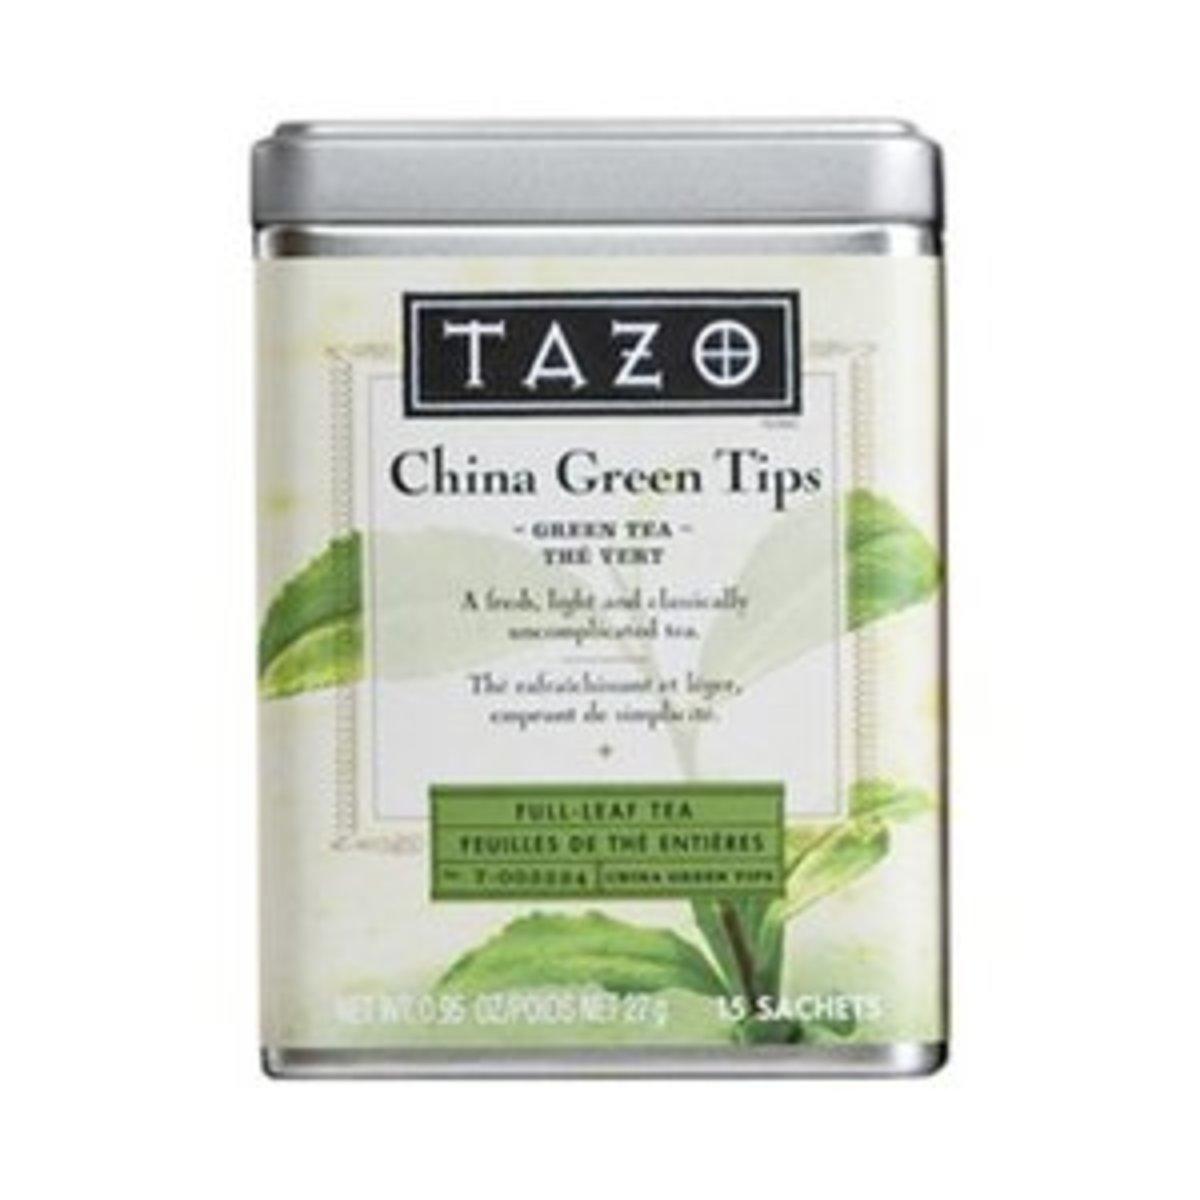 The classic green tea, China Green Tips.